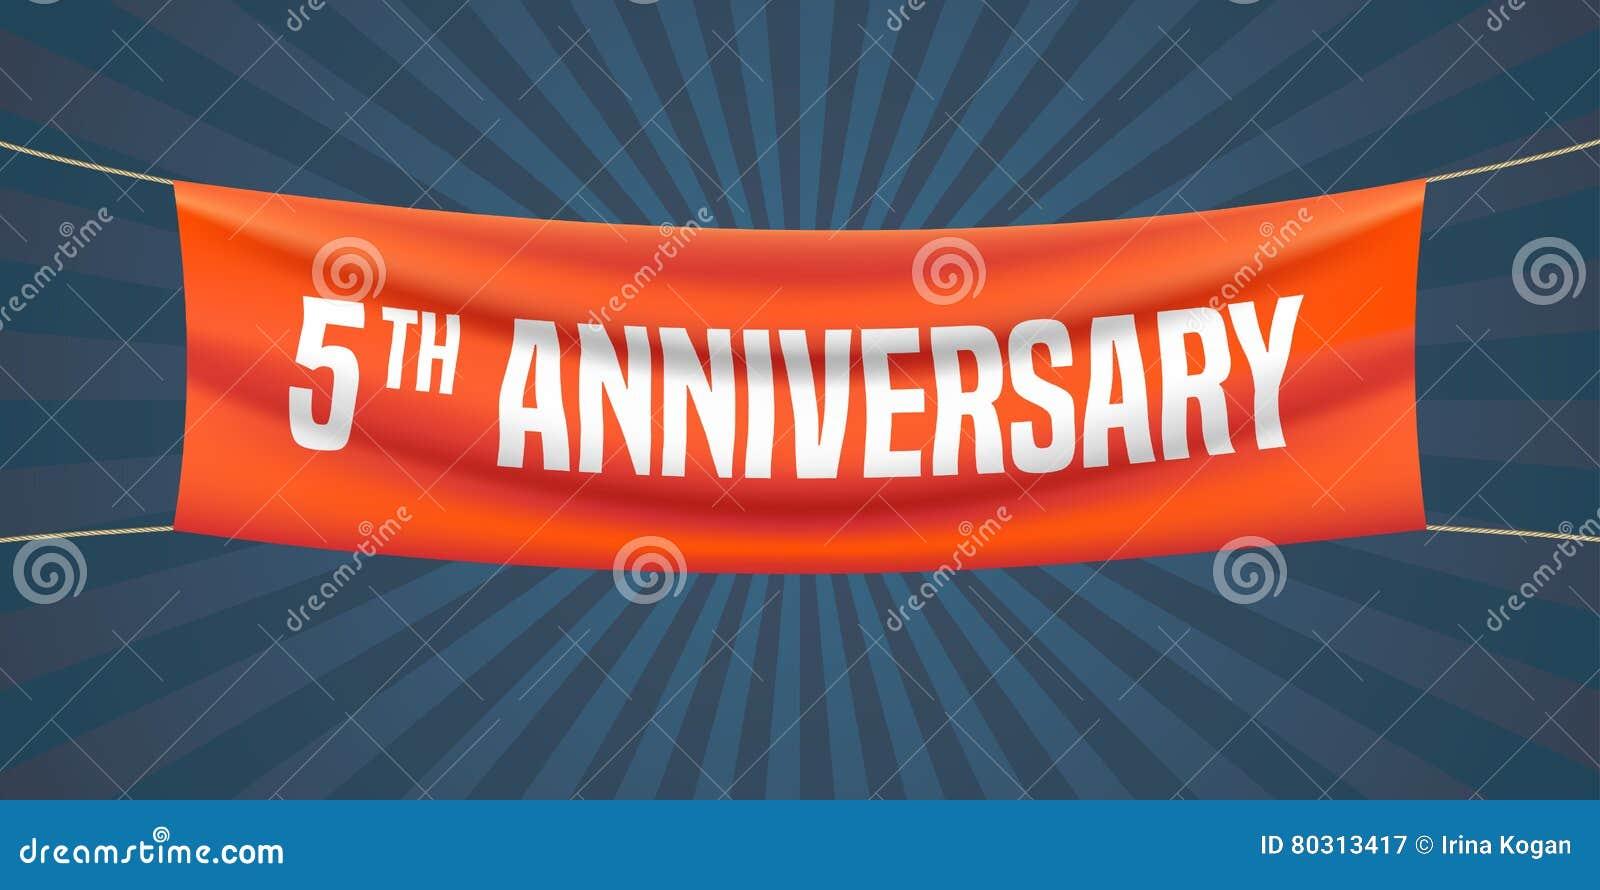 5 years anniversary vector illustration banner flyer stock 5 years anniversary vector illustration banner flyer biocorpaavc Gallery